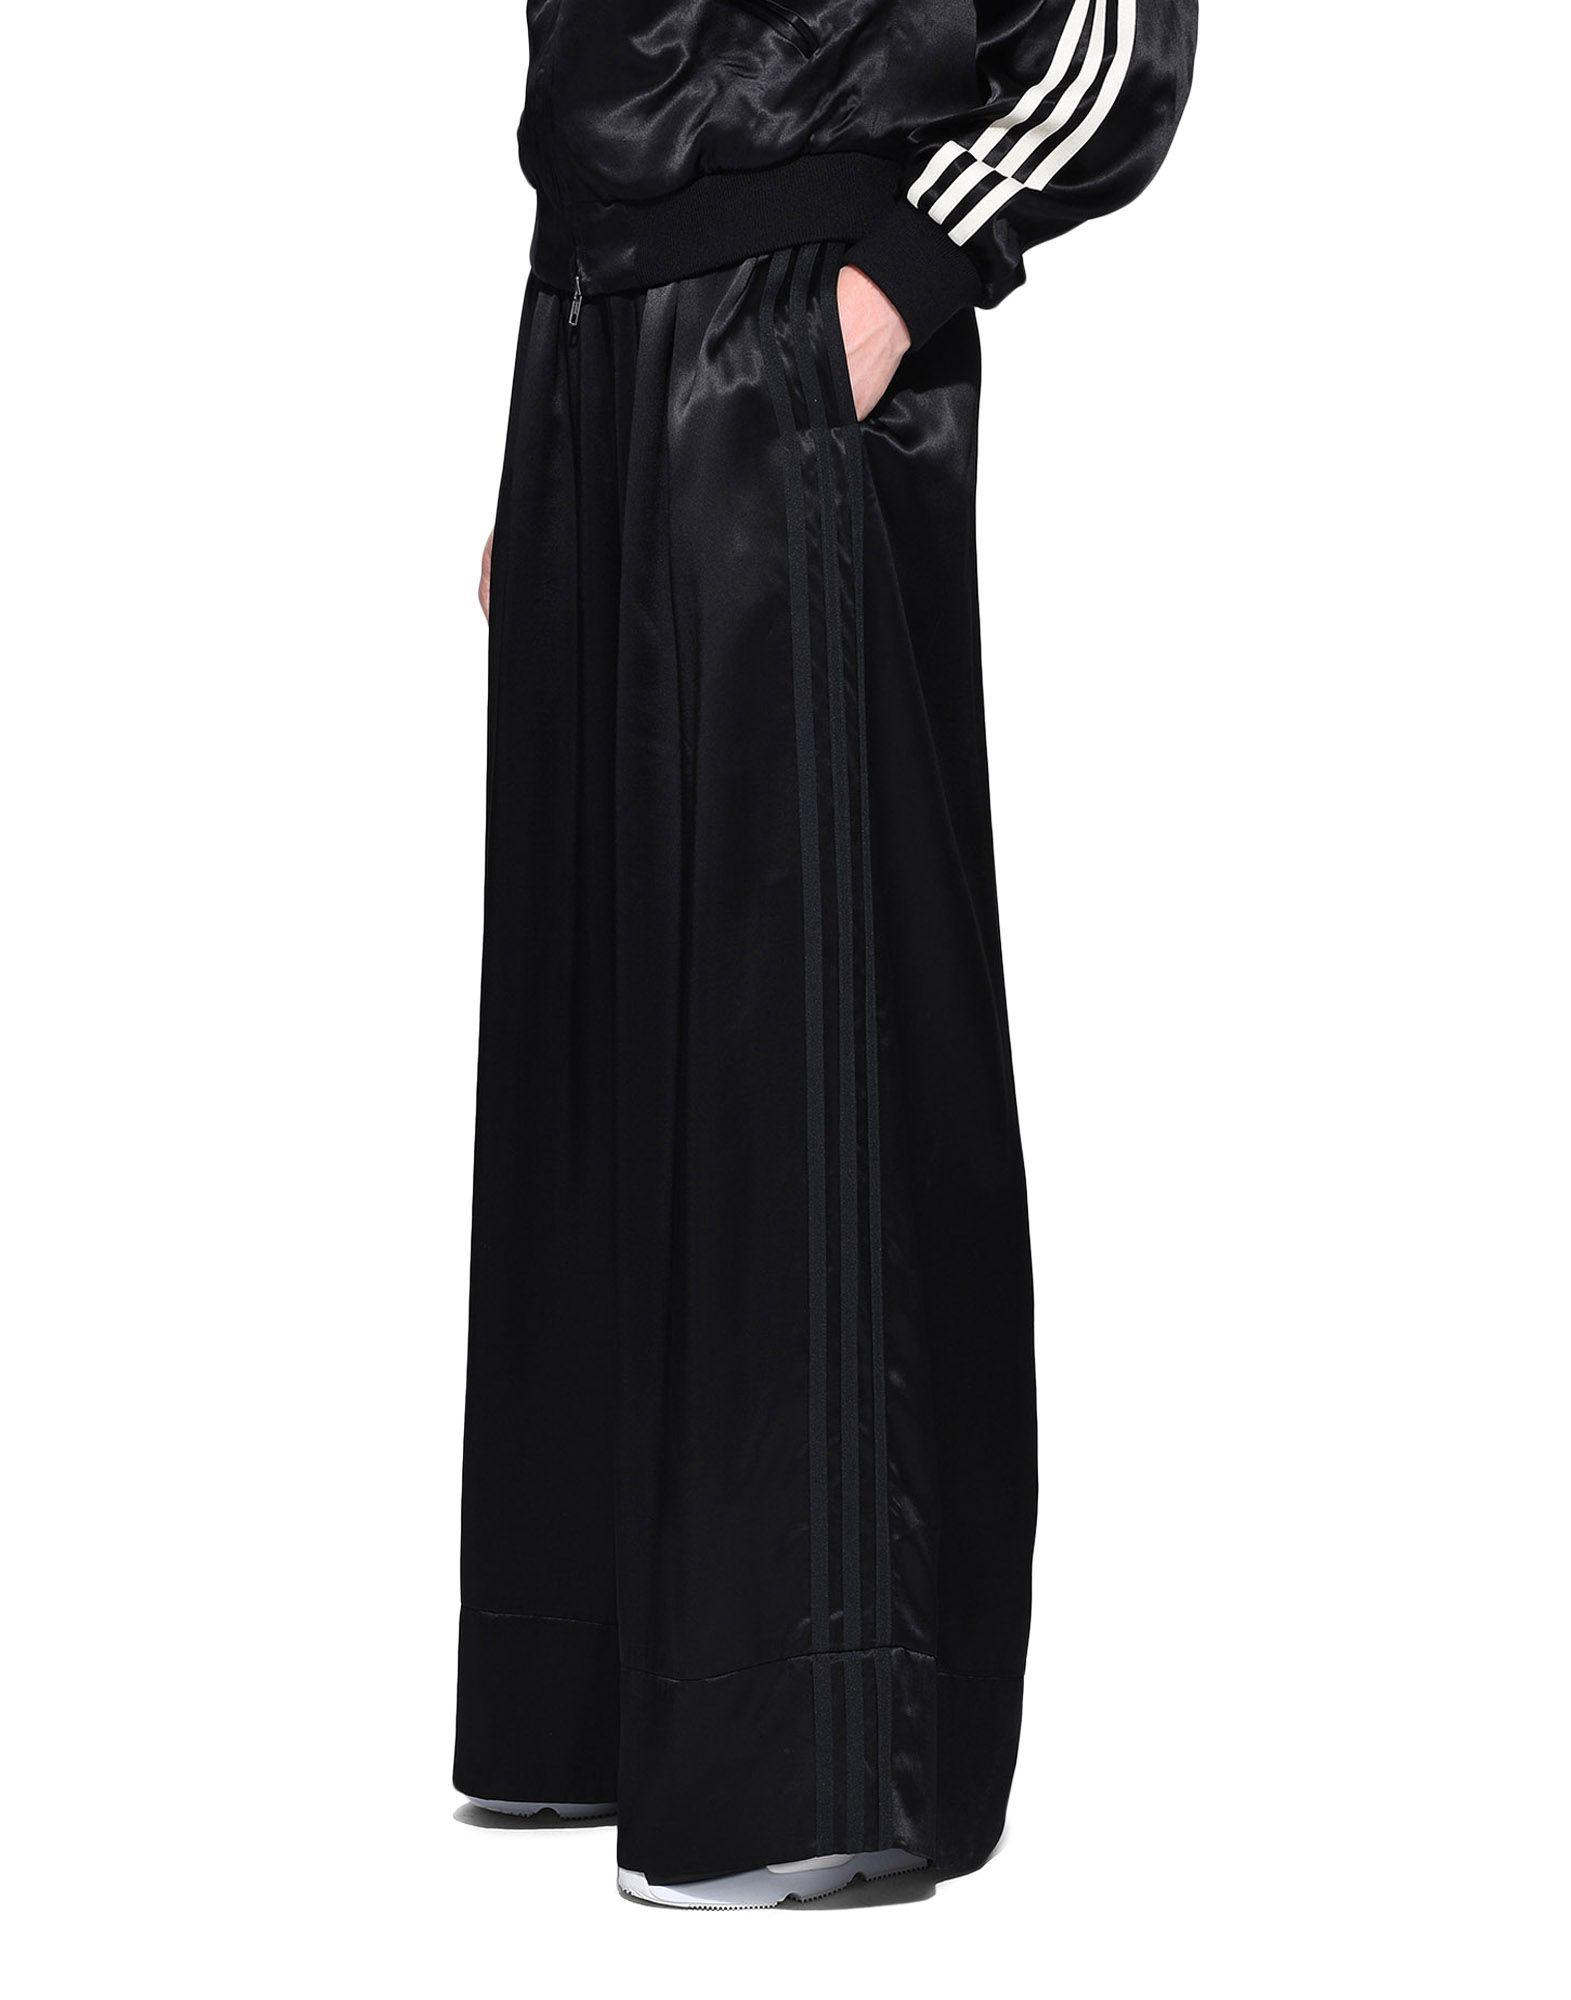 Y-3 Y-3 3-Stripes Lux Wide Track Pants Casual pants Woman e